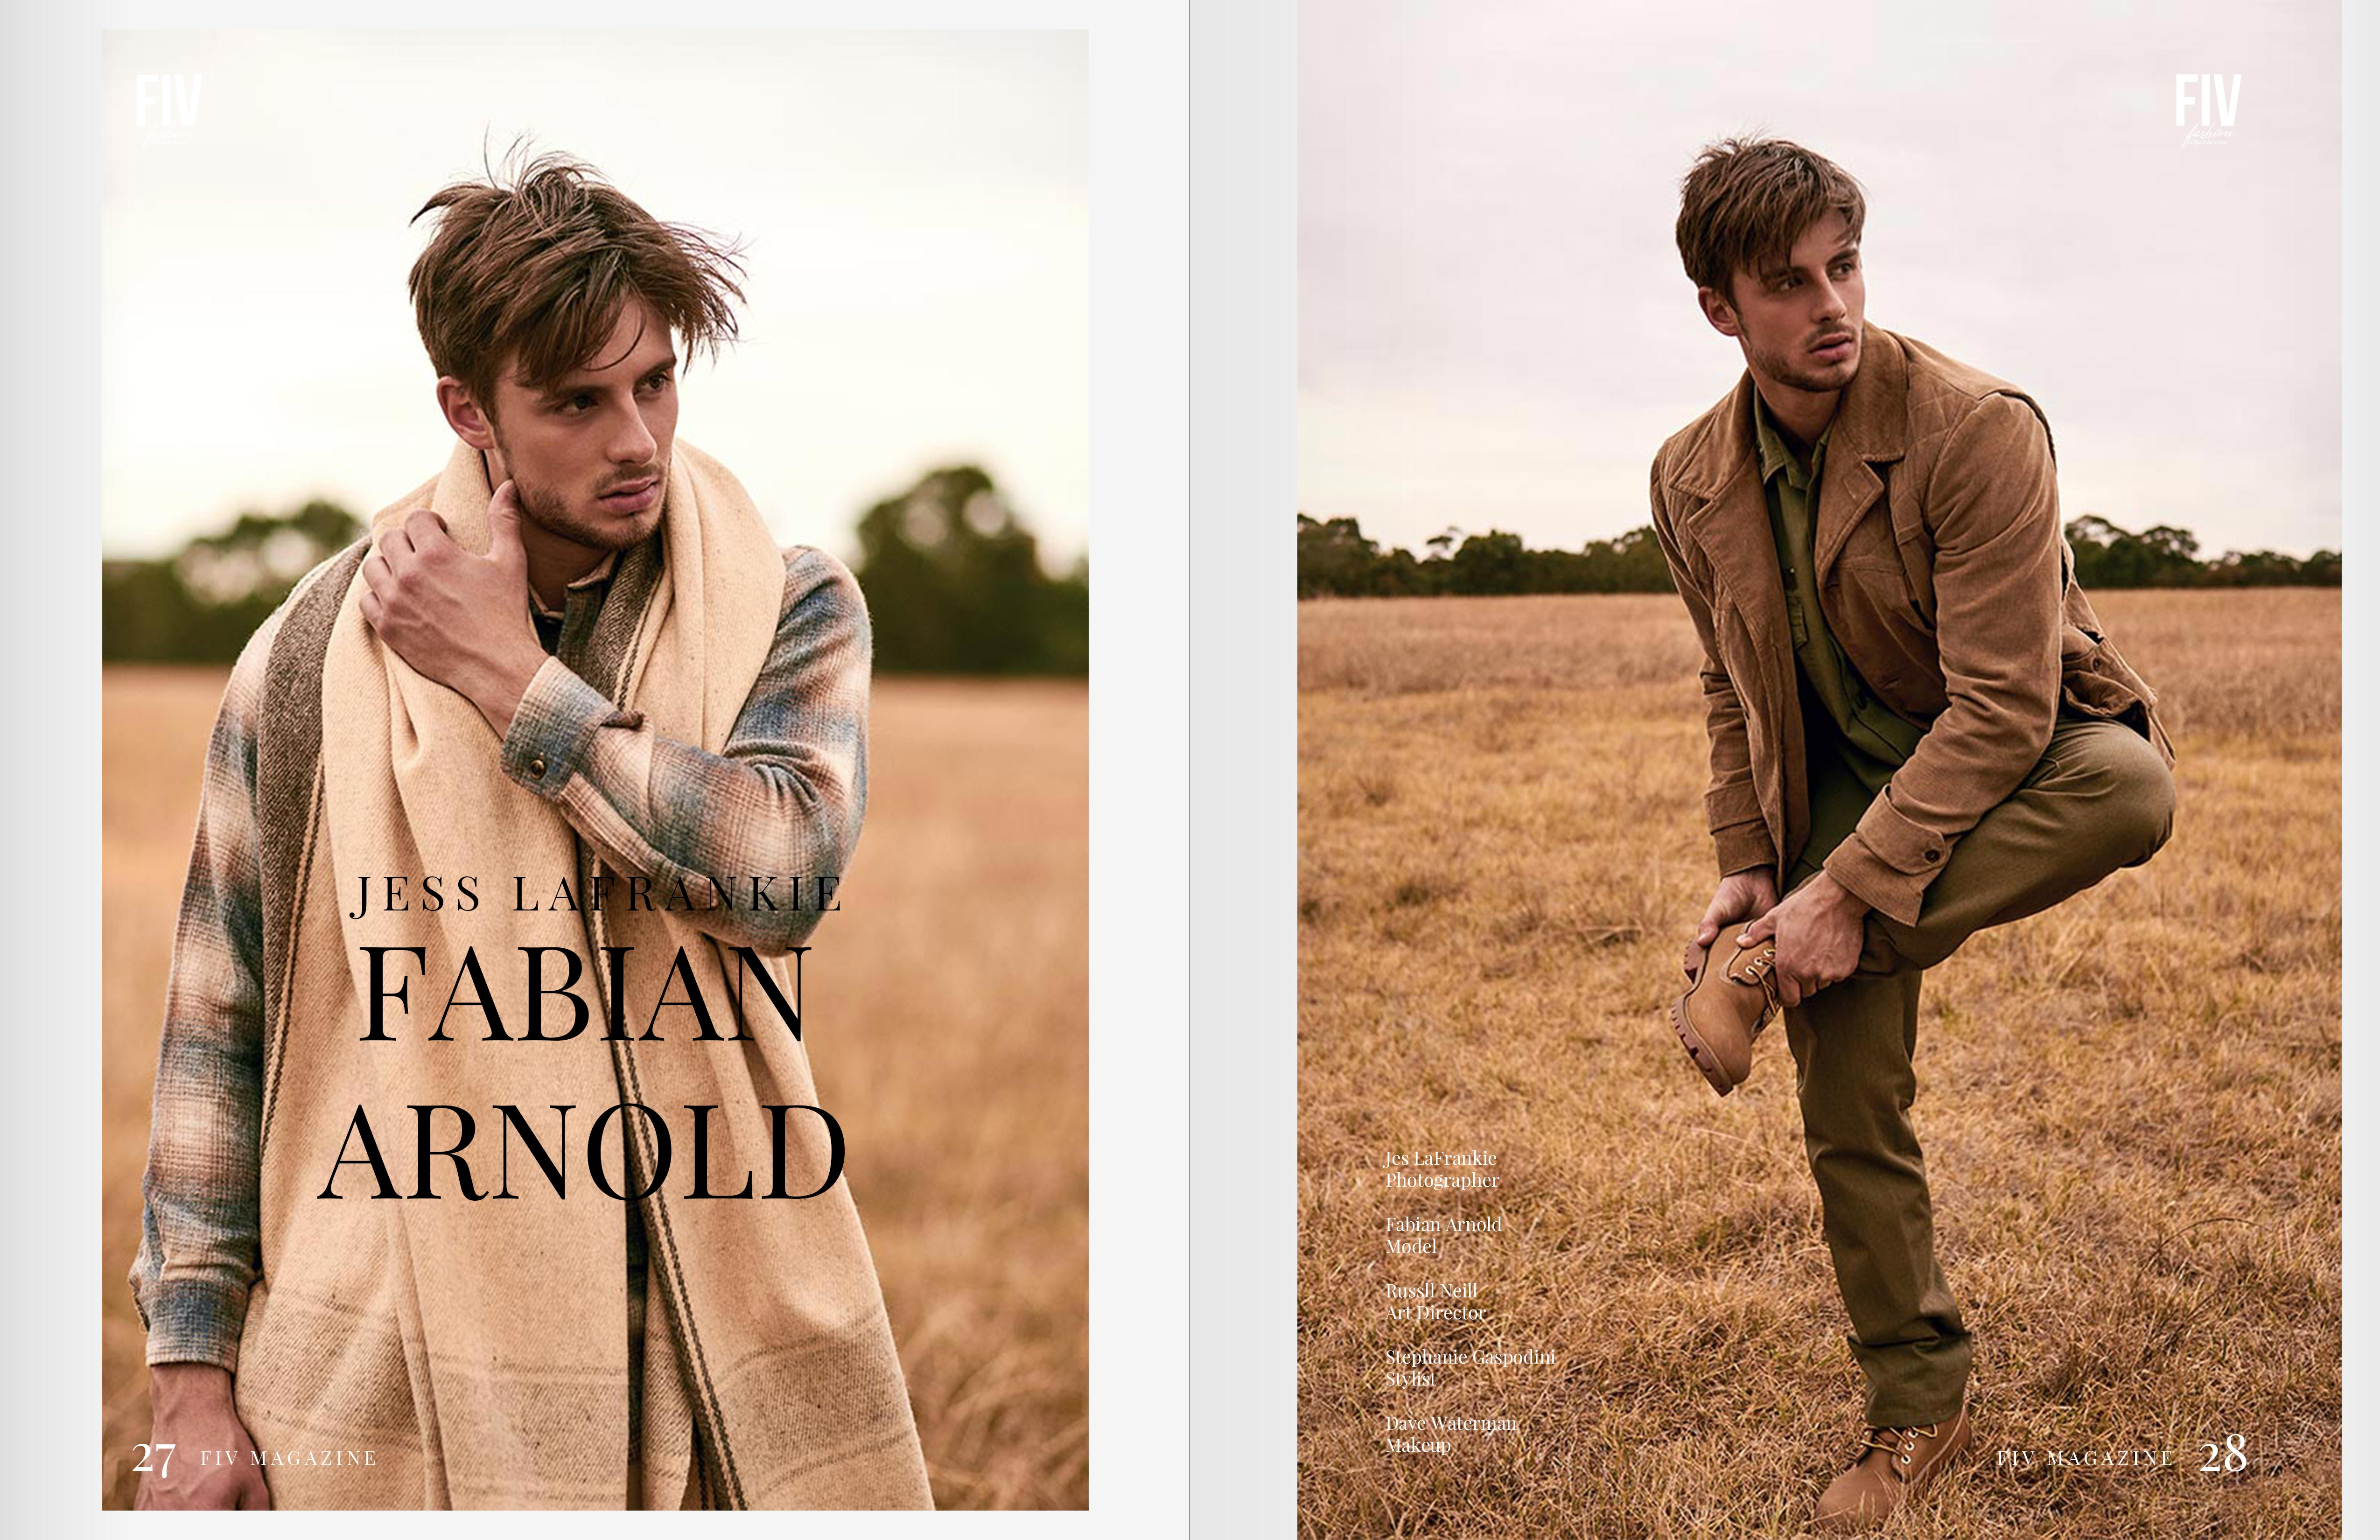 Wonderful Shooting In Australia Jess Lafrankie X Fabian Arnold